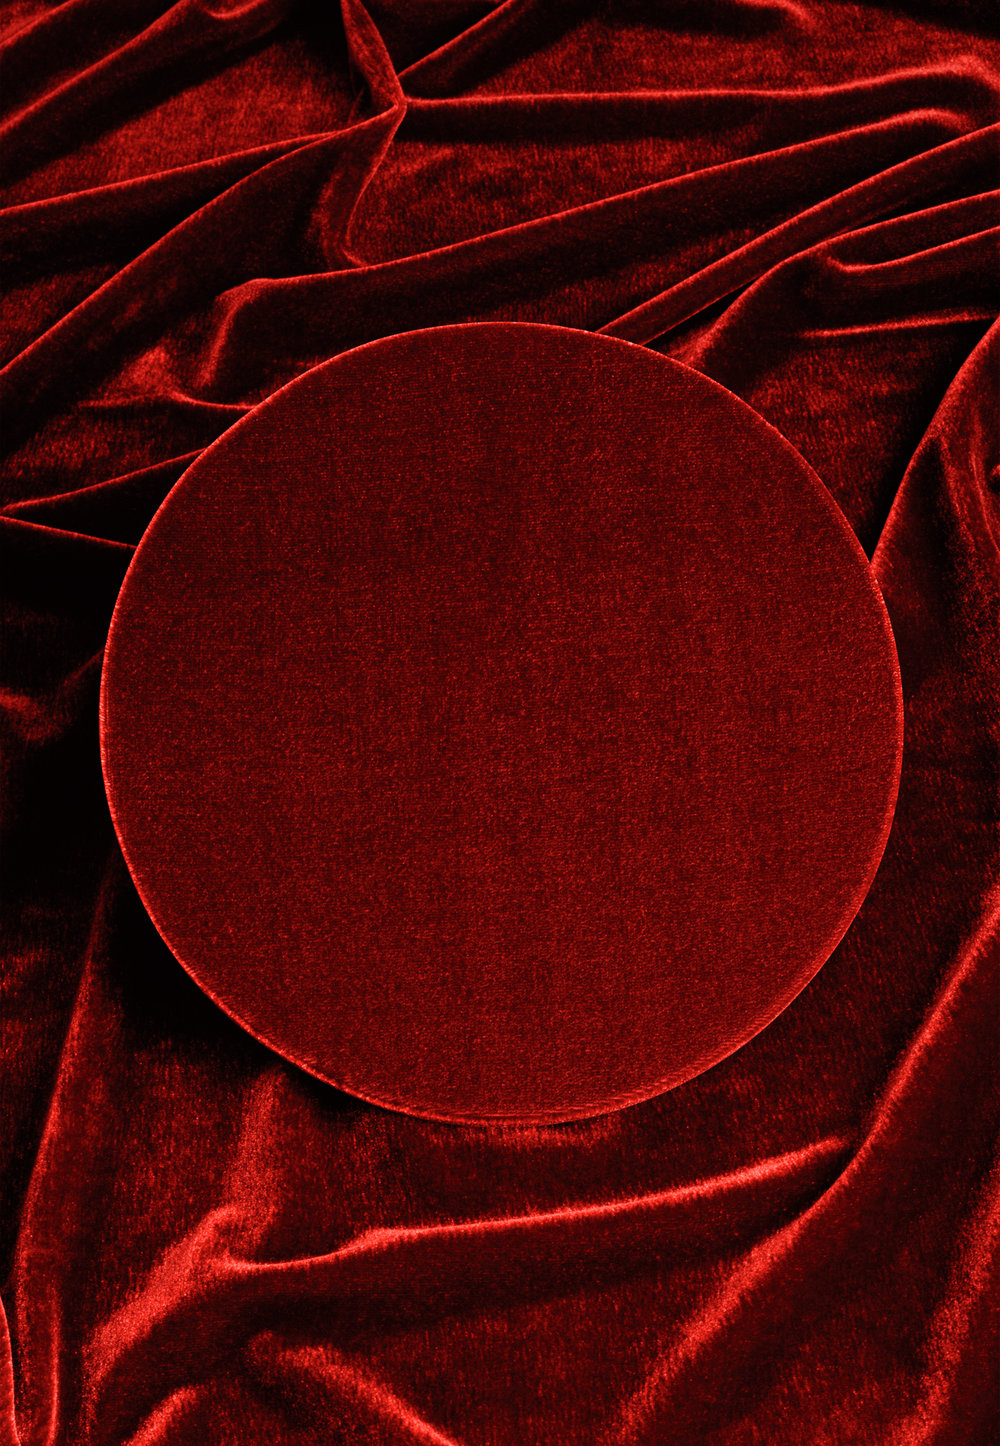 Roter Kreis 1, 2016 C-Print, 52,5 x 36 cm